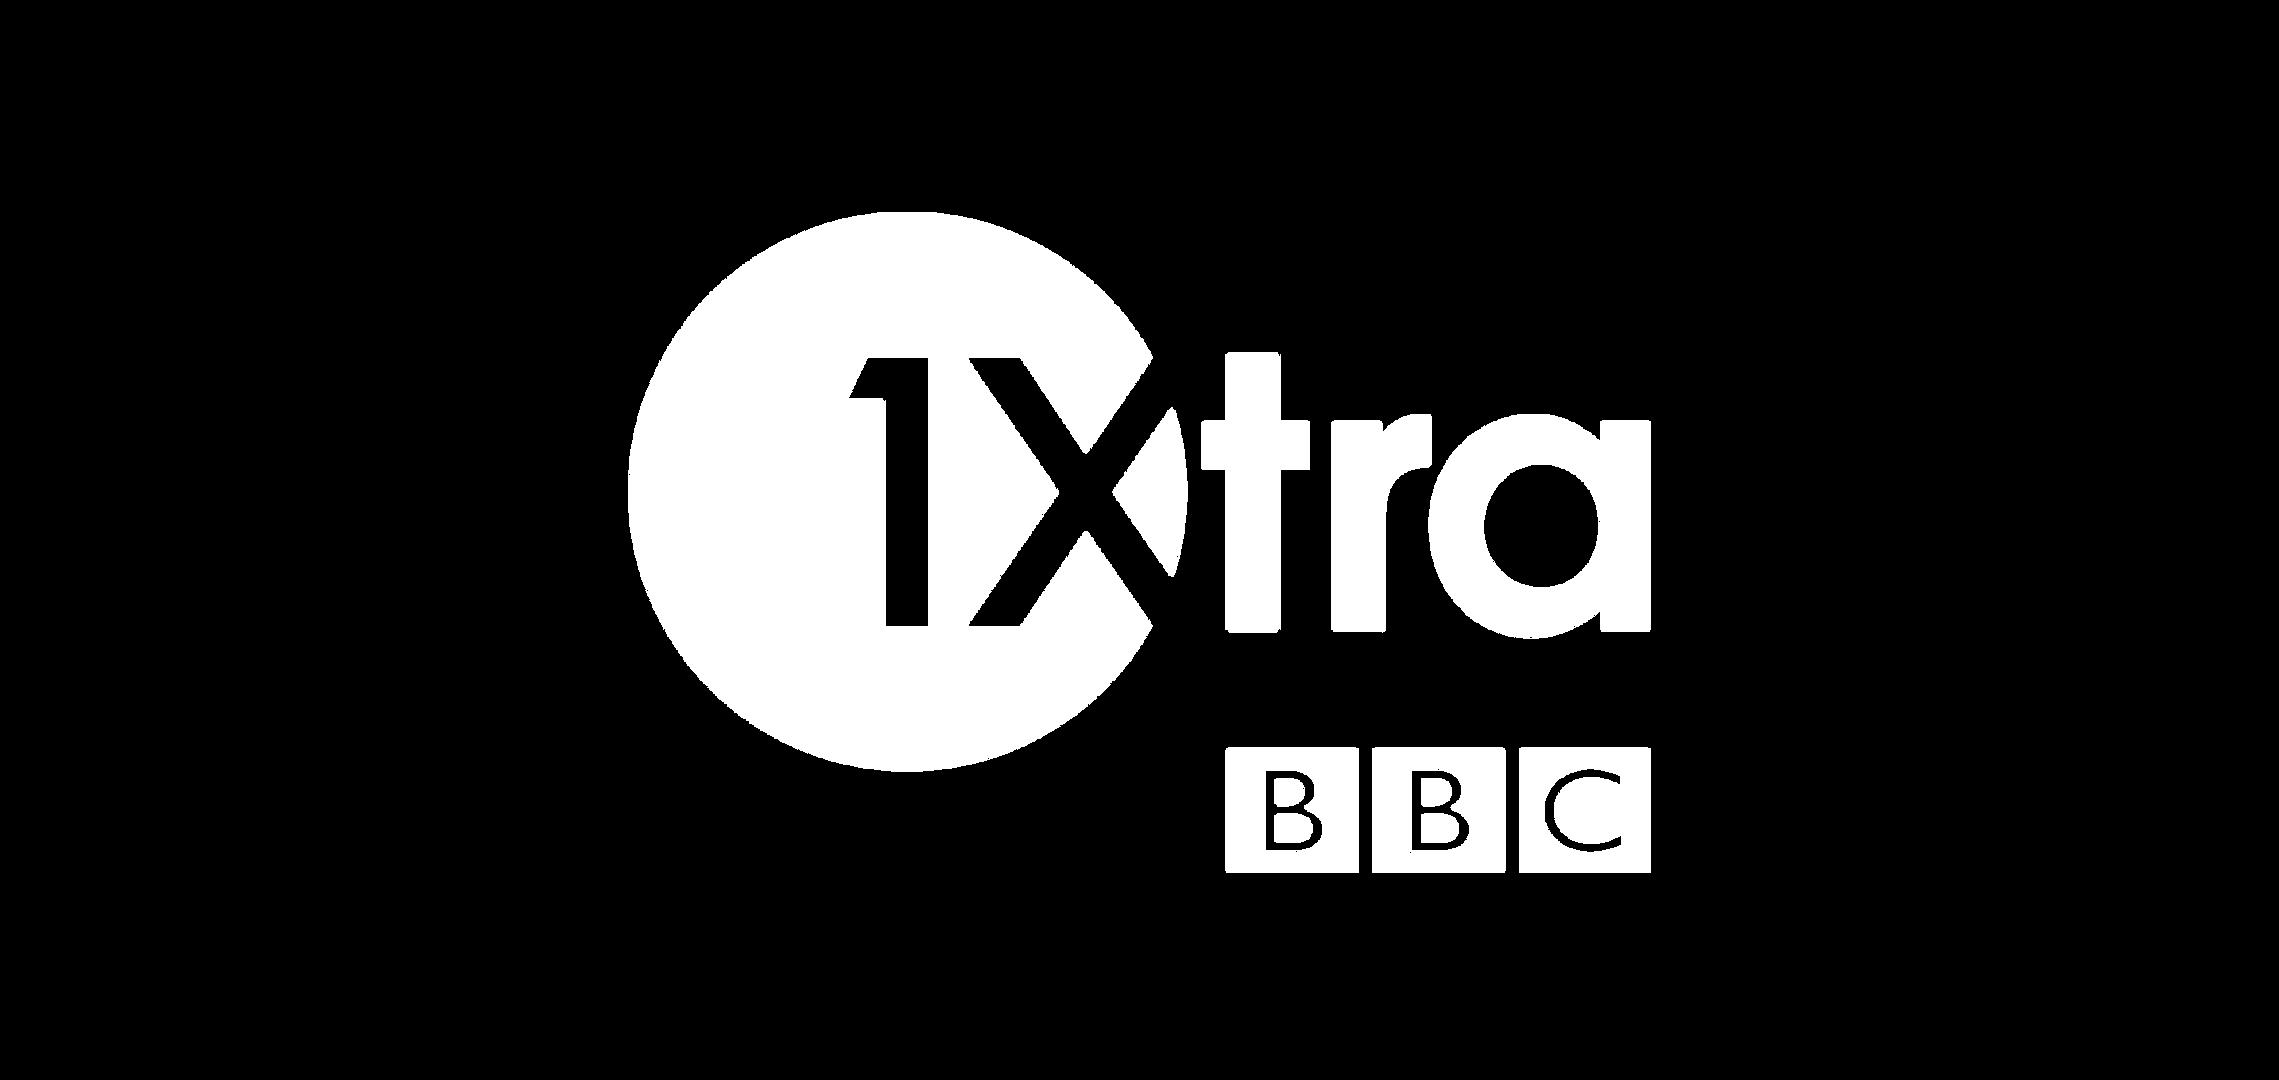 1xtra BBC.png